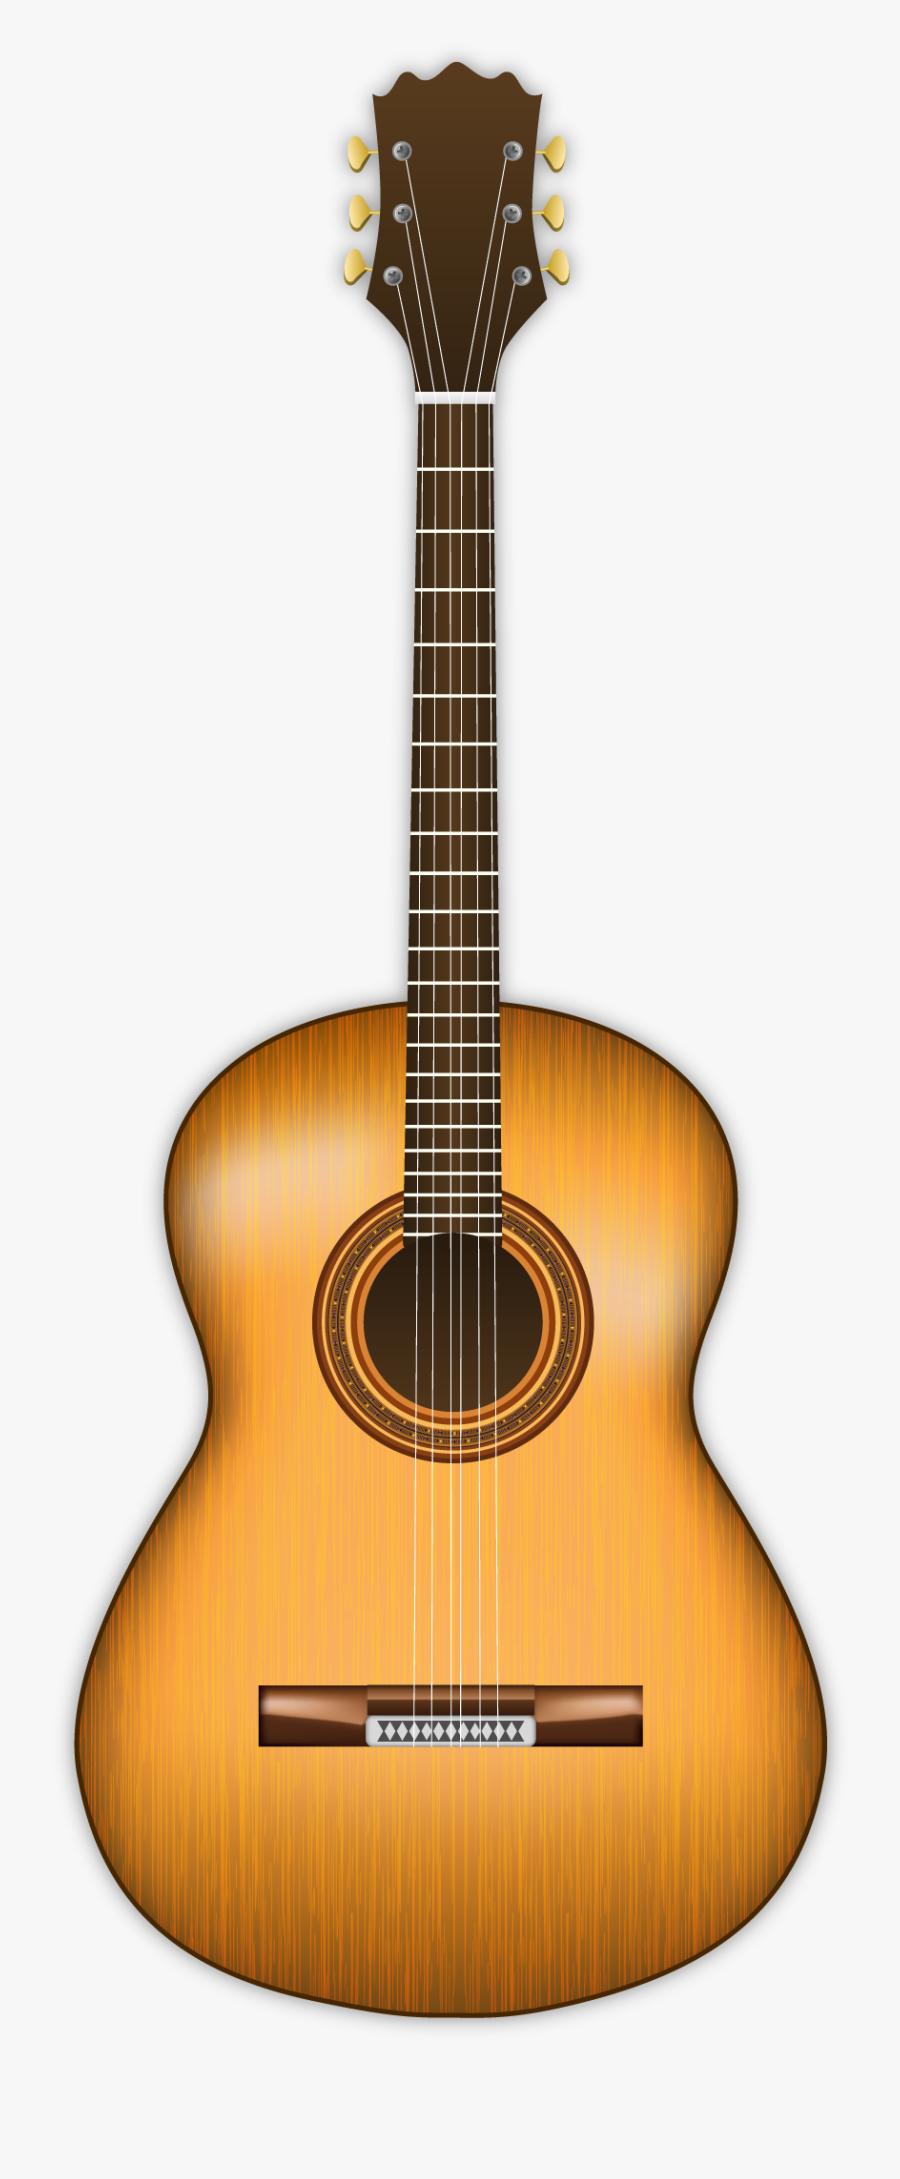 Guitar Clipart Png Image - Classical Parlor Guitar, Transparent Clipart